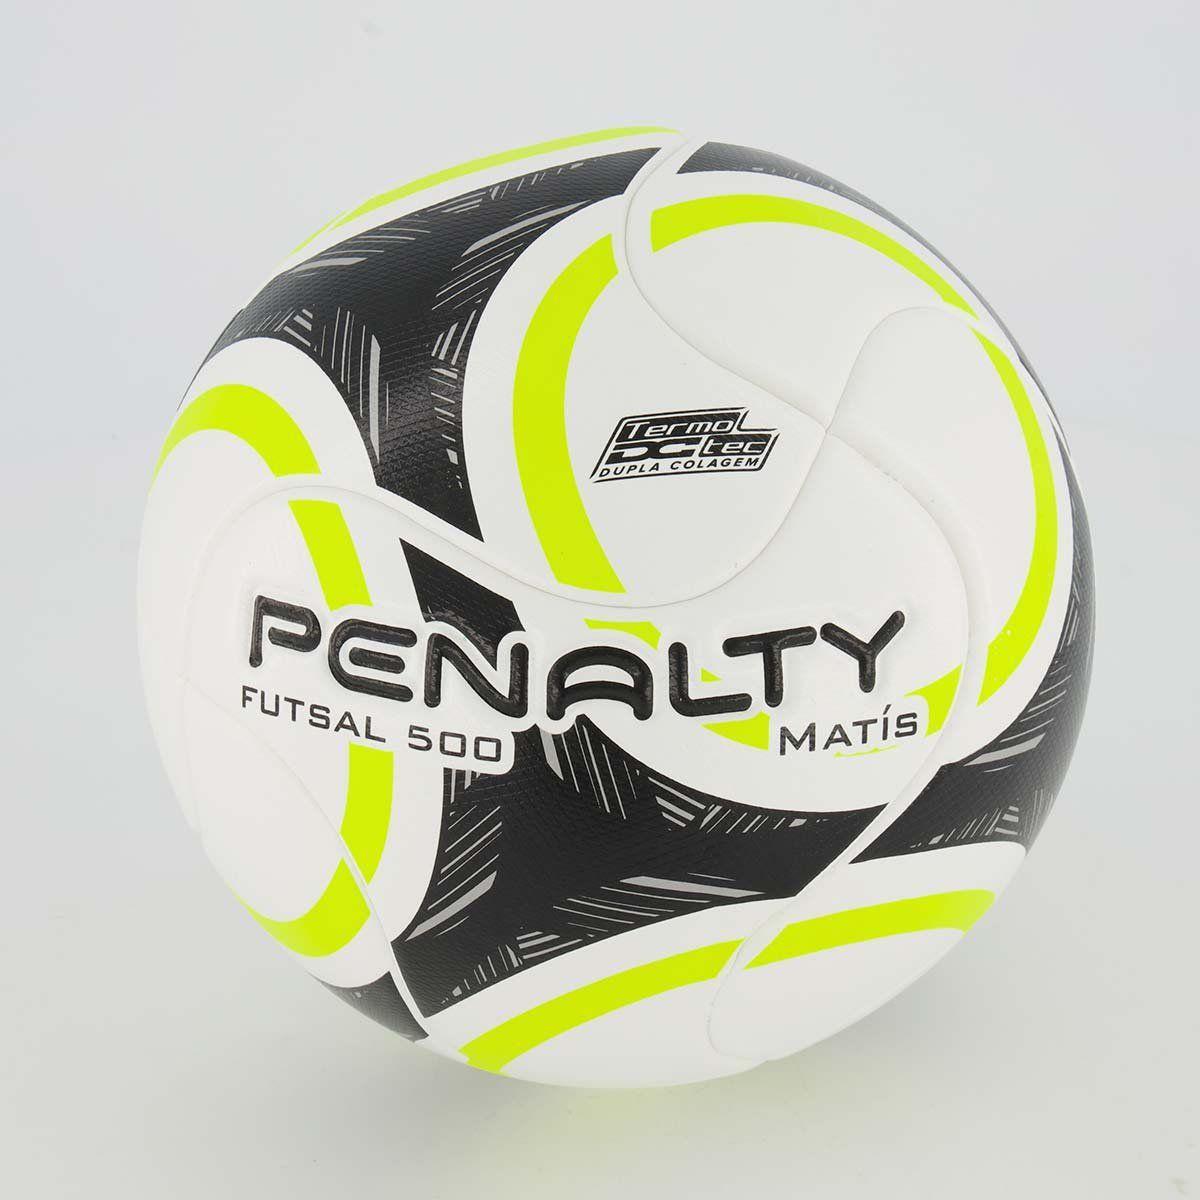 Cupom de desconto Bola Penalty Matís 500 IX Futsal Preta e Amarela